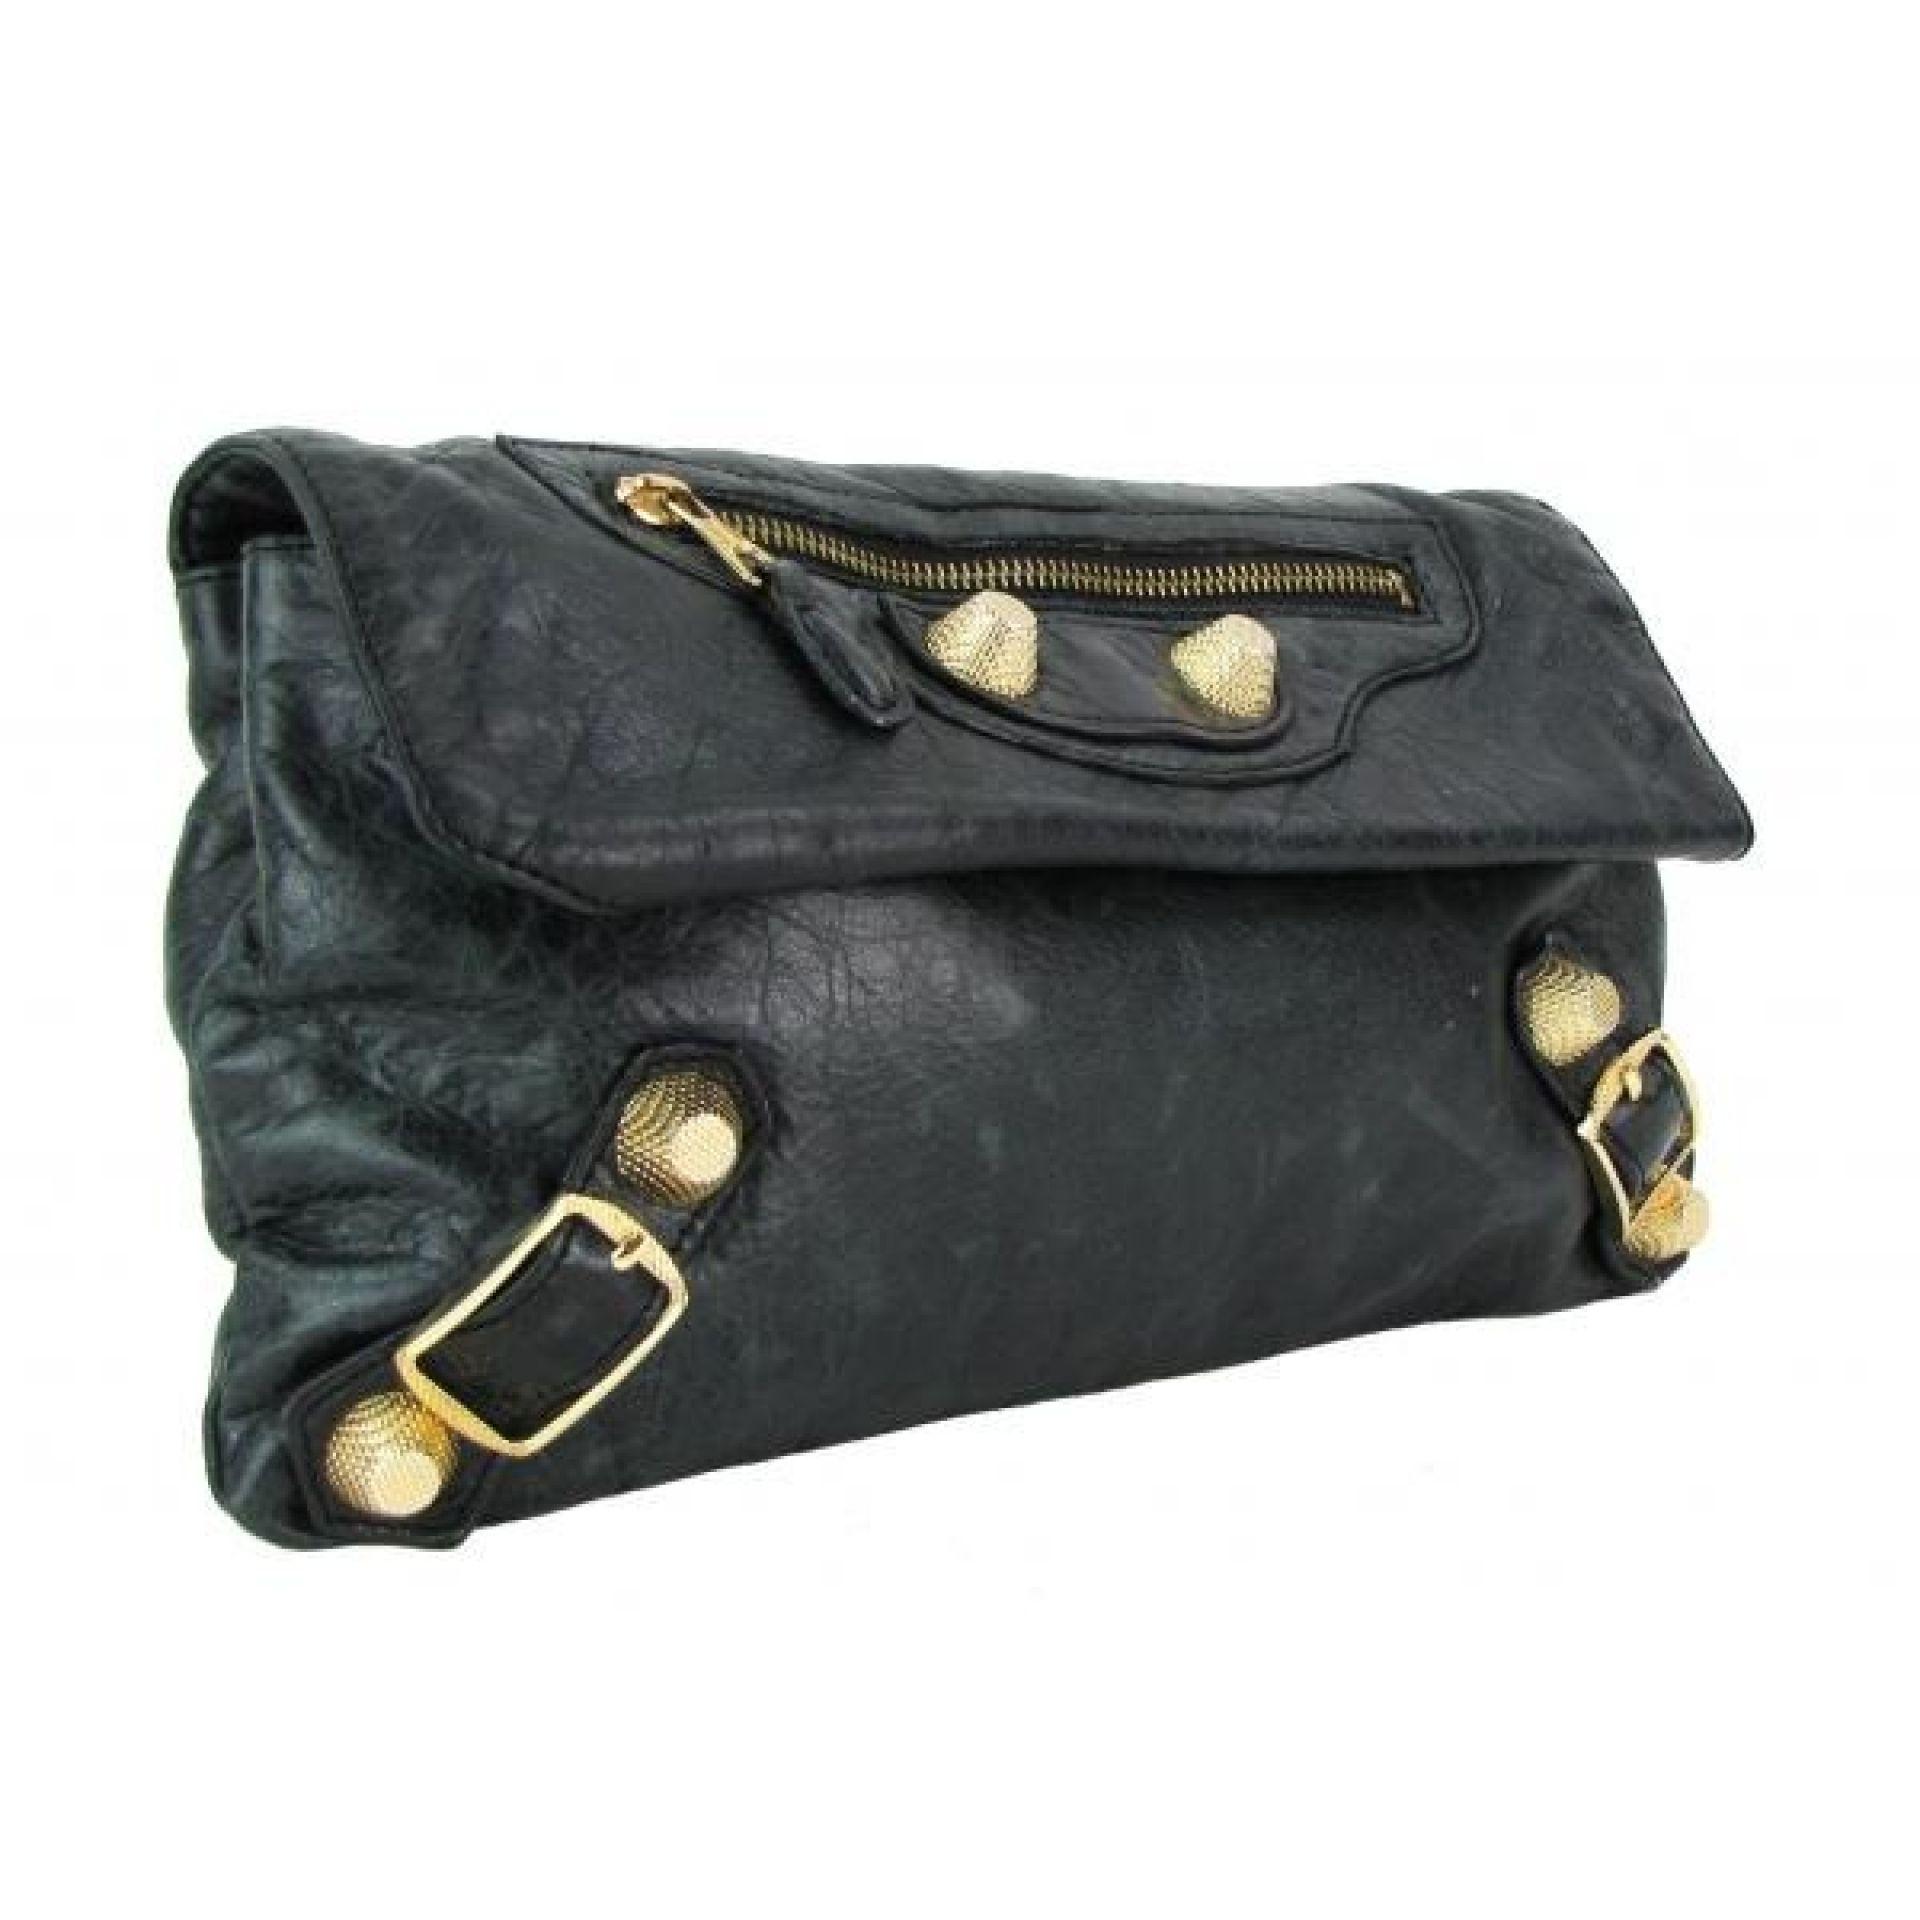 Balenciaga Dark Green Leather Giant 21 Envelope Clutch Bag